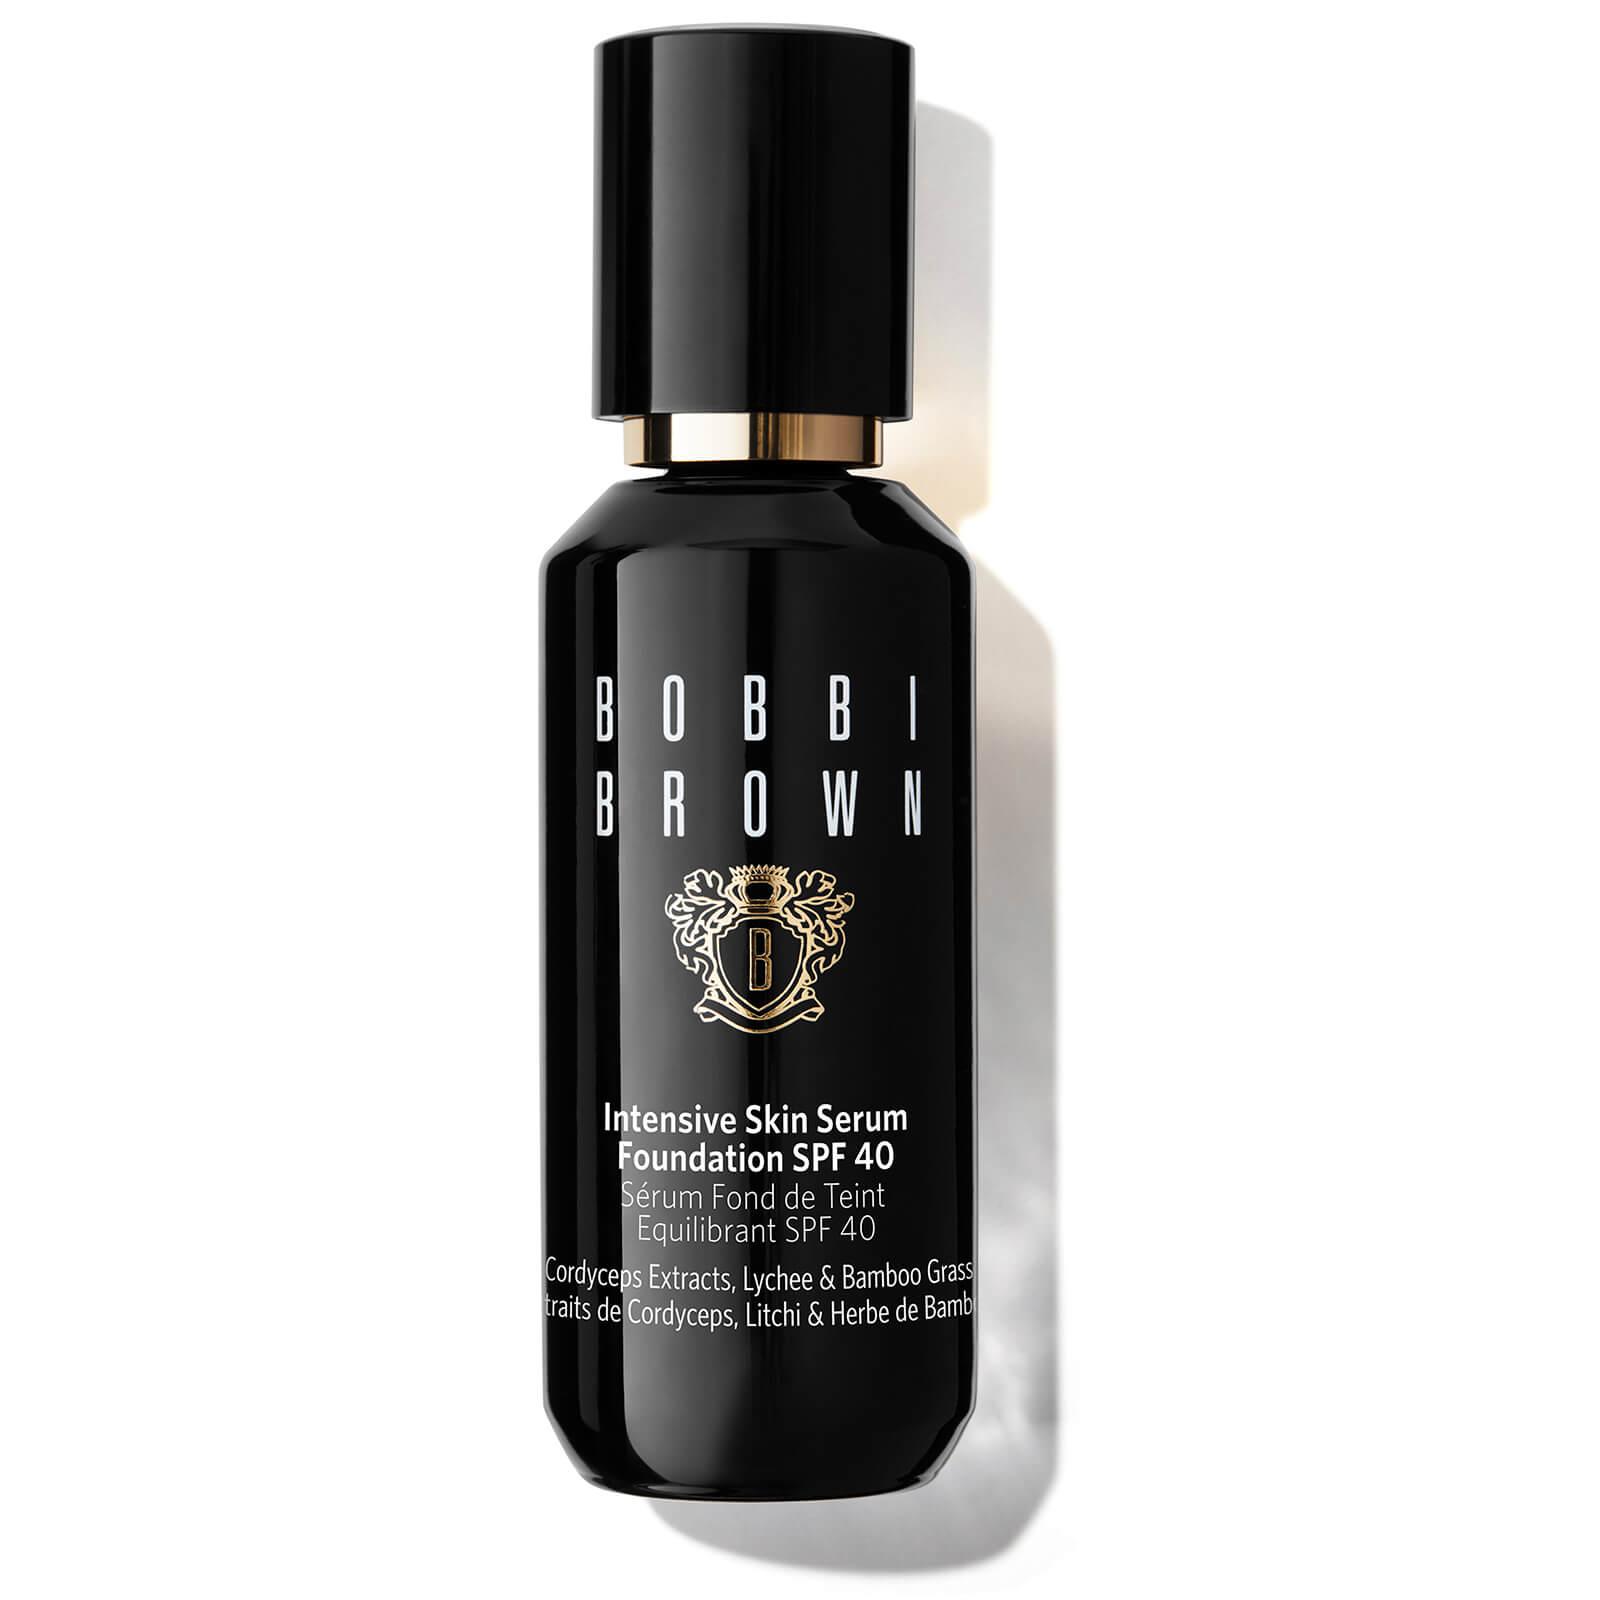 Bobbi Brown Intensive Skin Serum Foundation SPF40 30ml (Various Shades) - Warm Honey